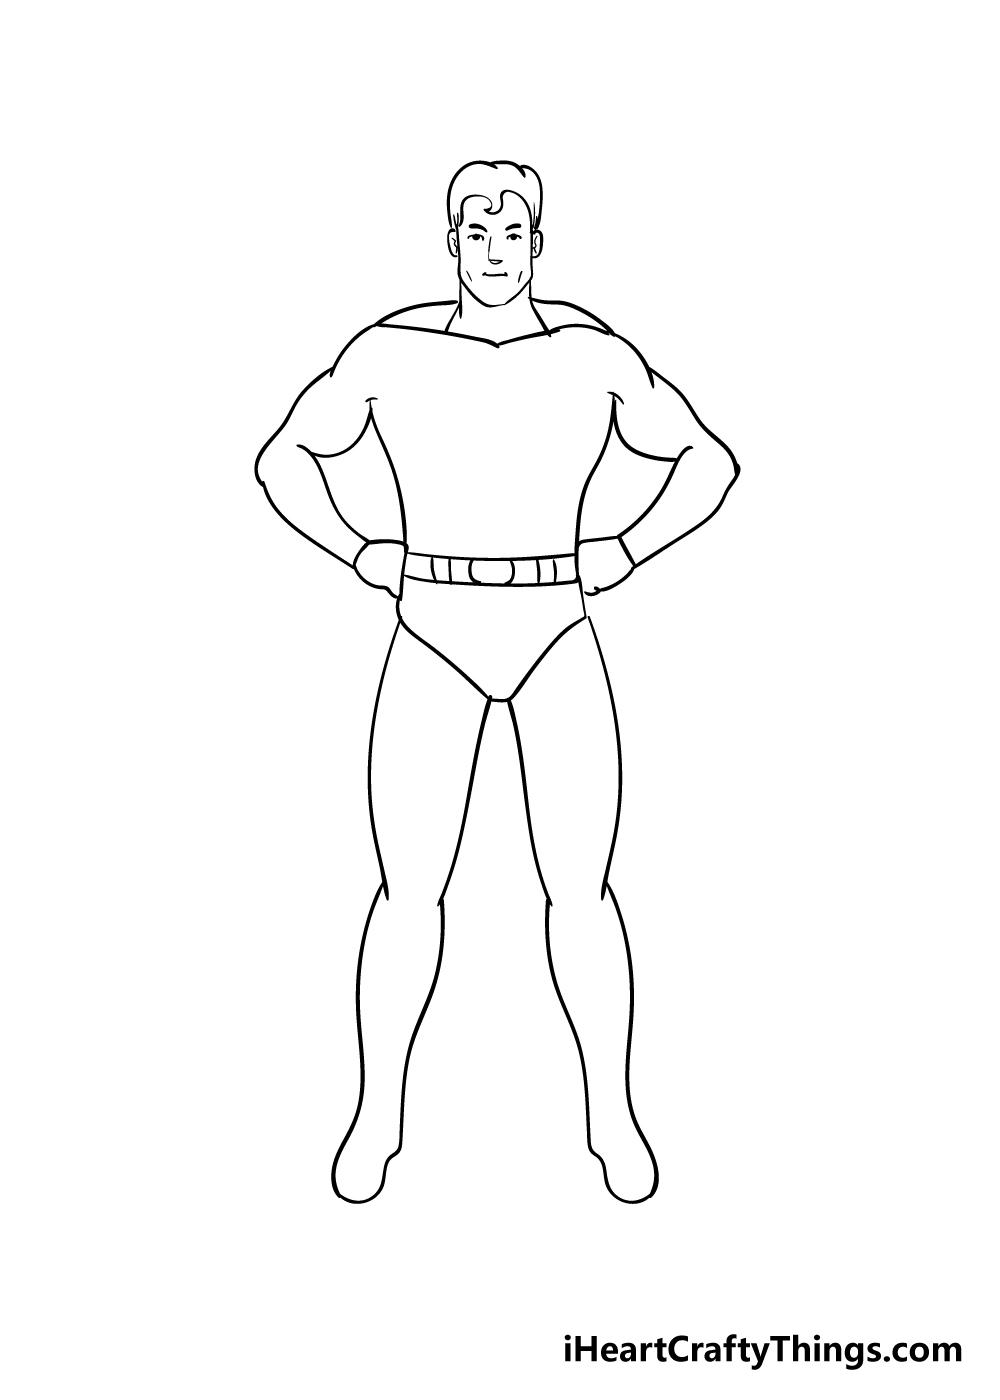 superhero drawing step 5